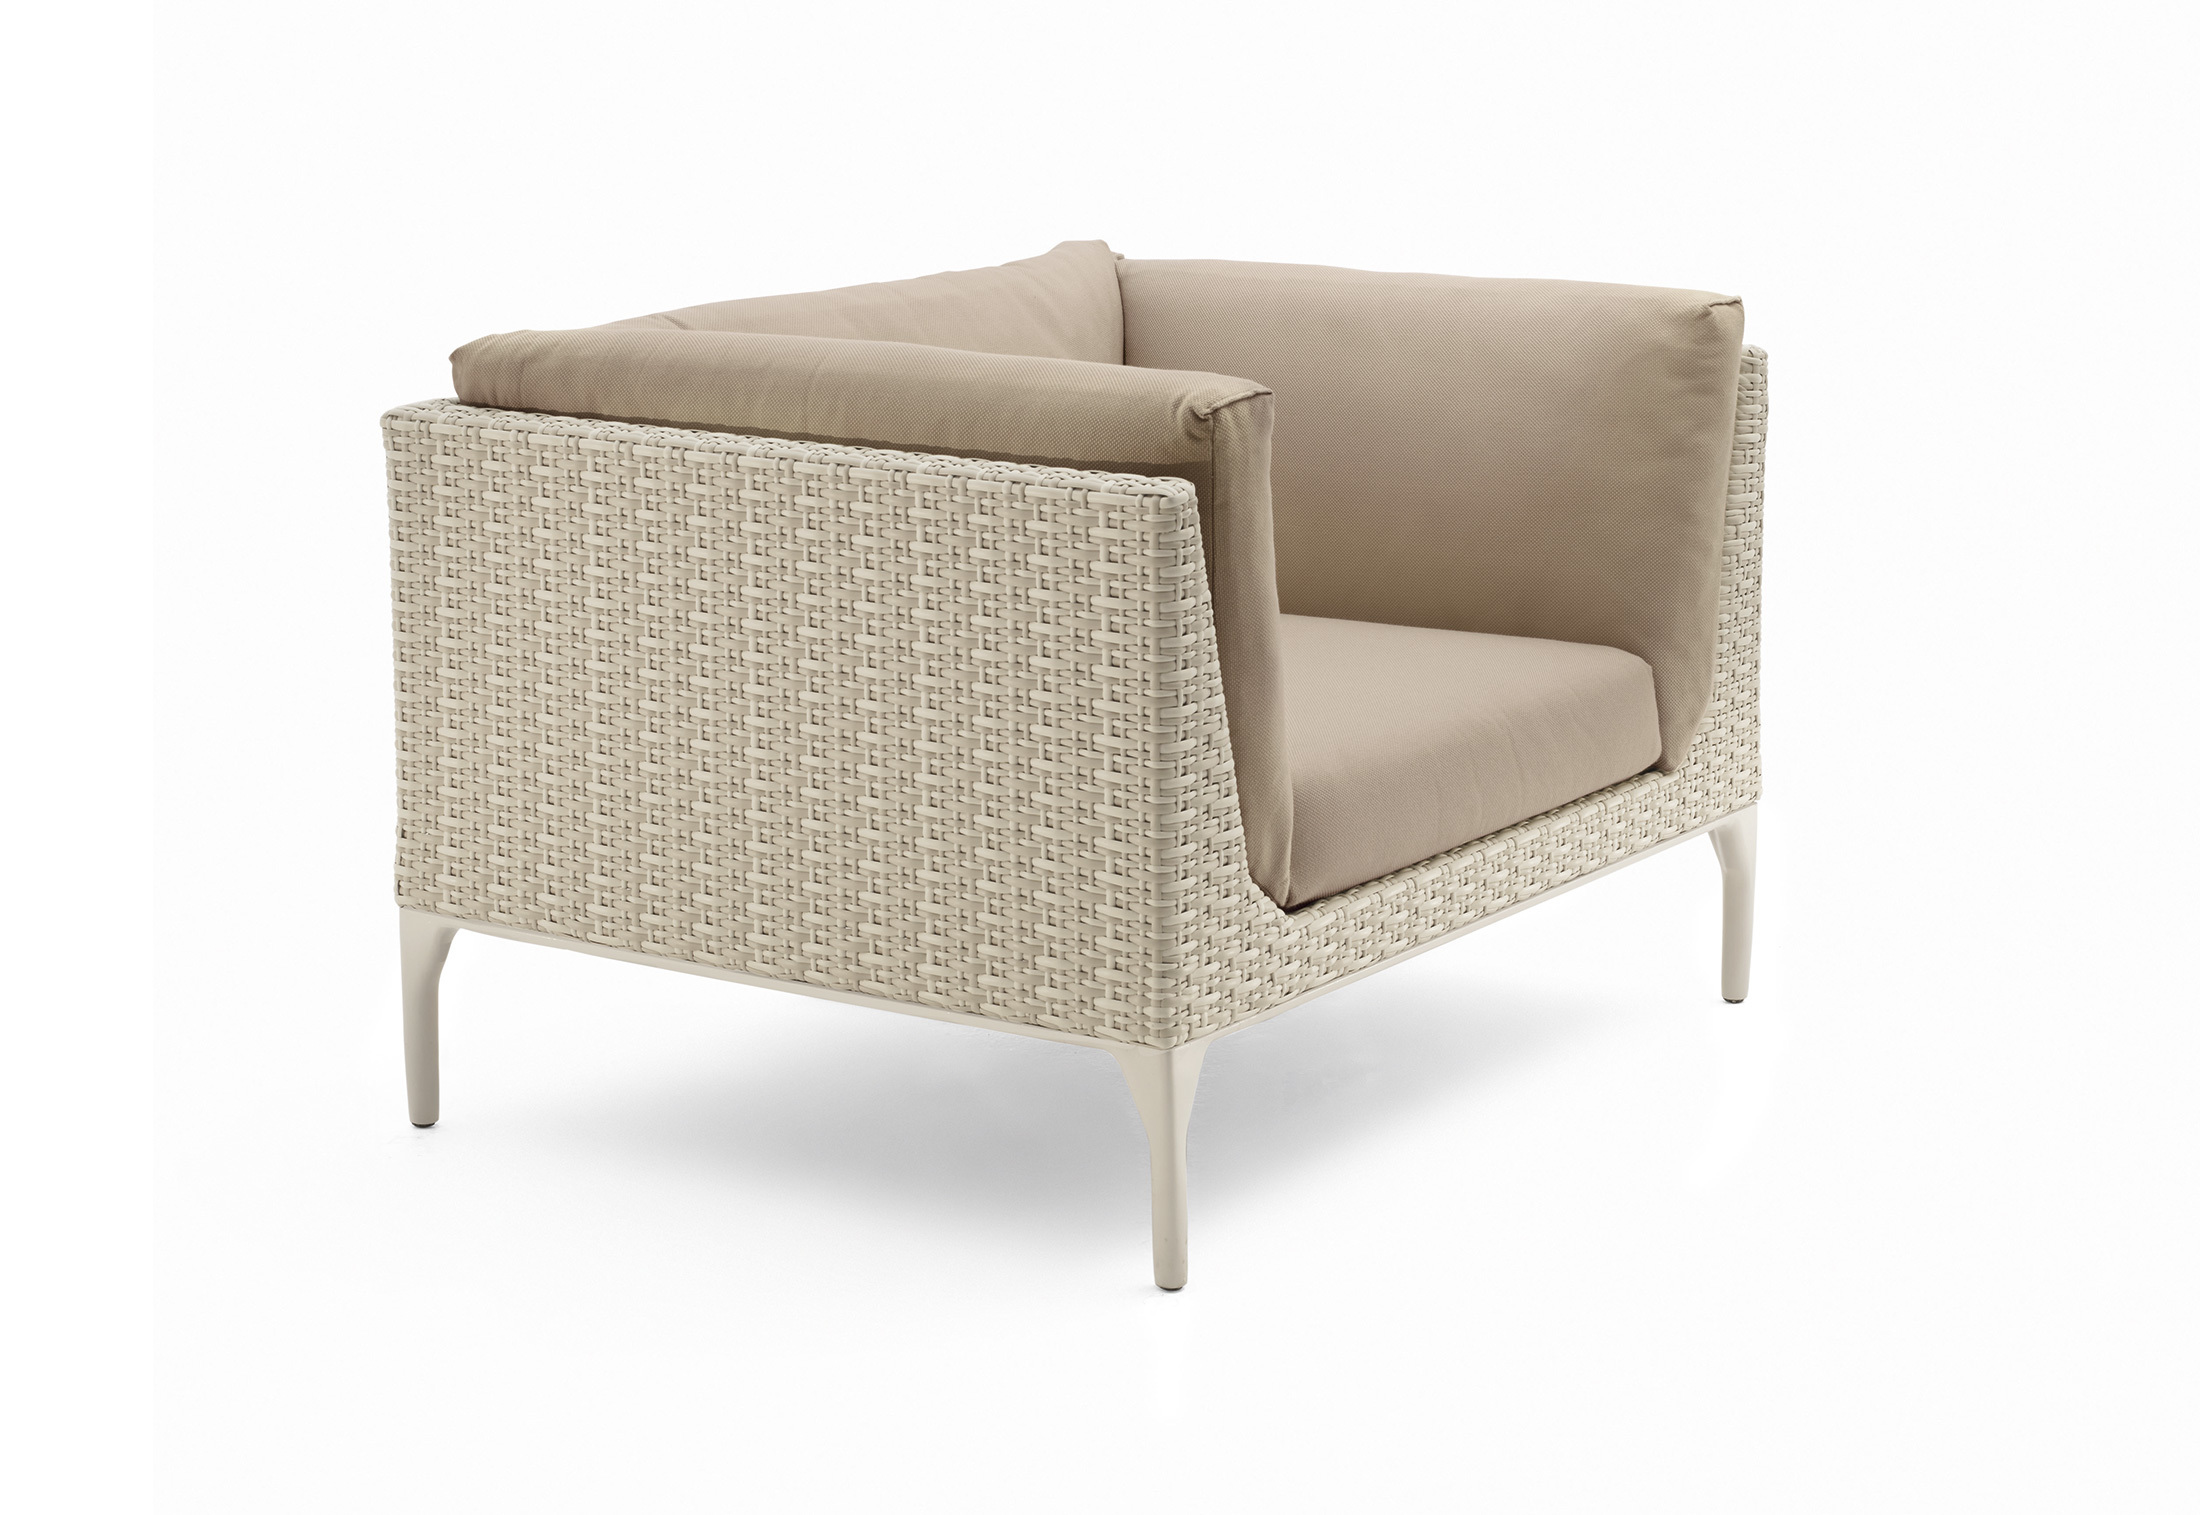 Amazing Mu Lounge Chair By Dedon Stylepark Machost Co Dining Chair Design Ideas Machostcouk